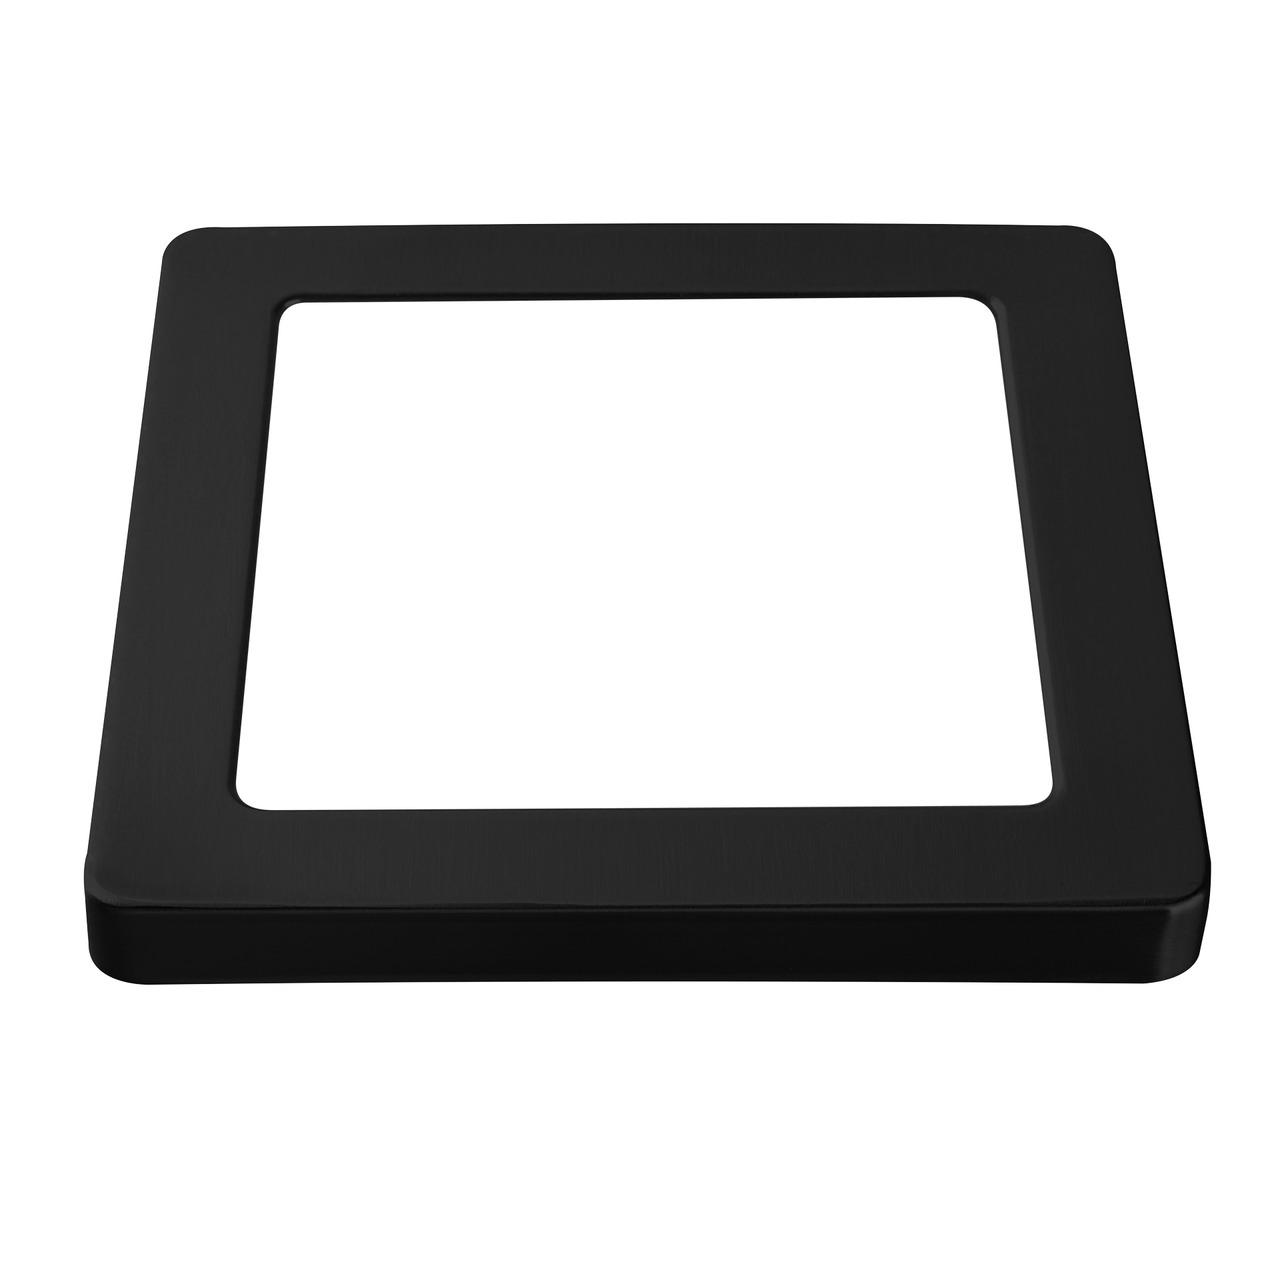 HEITRONIC Metallring für LED-Panel SELESTO- eckig- schwarz